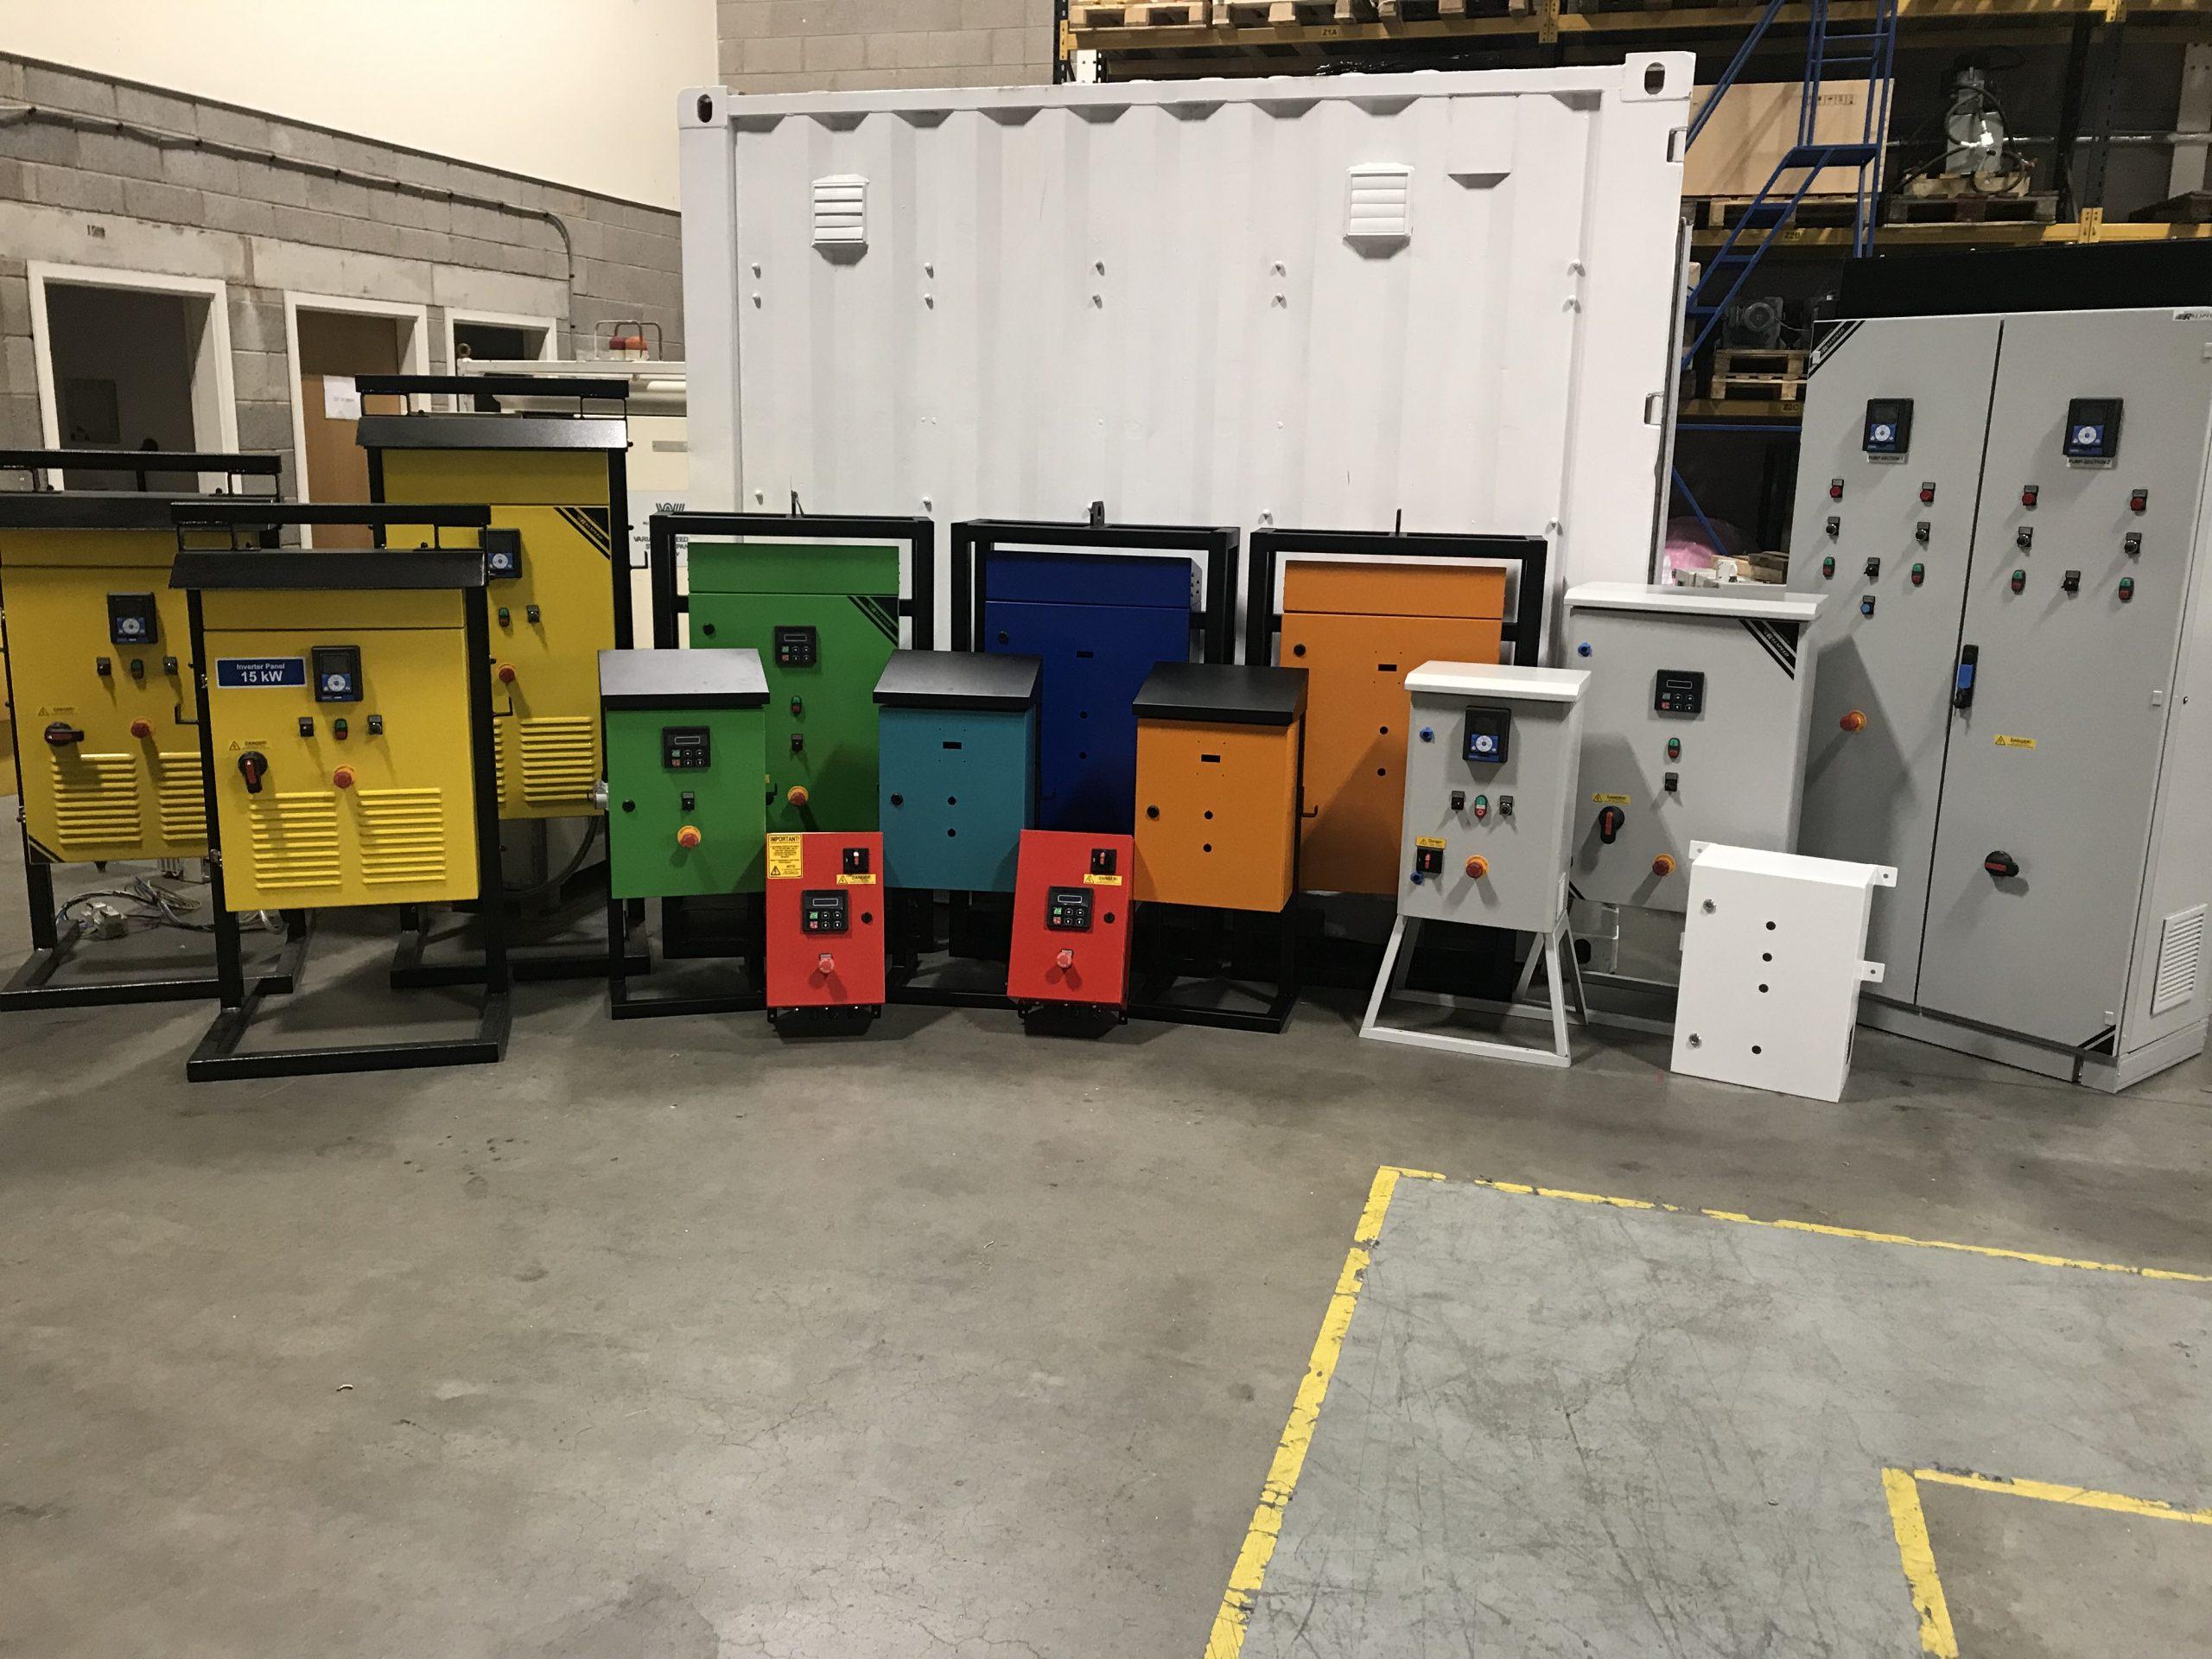 Recruiting for a Mechanical / Electrical Assembler